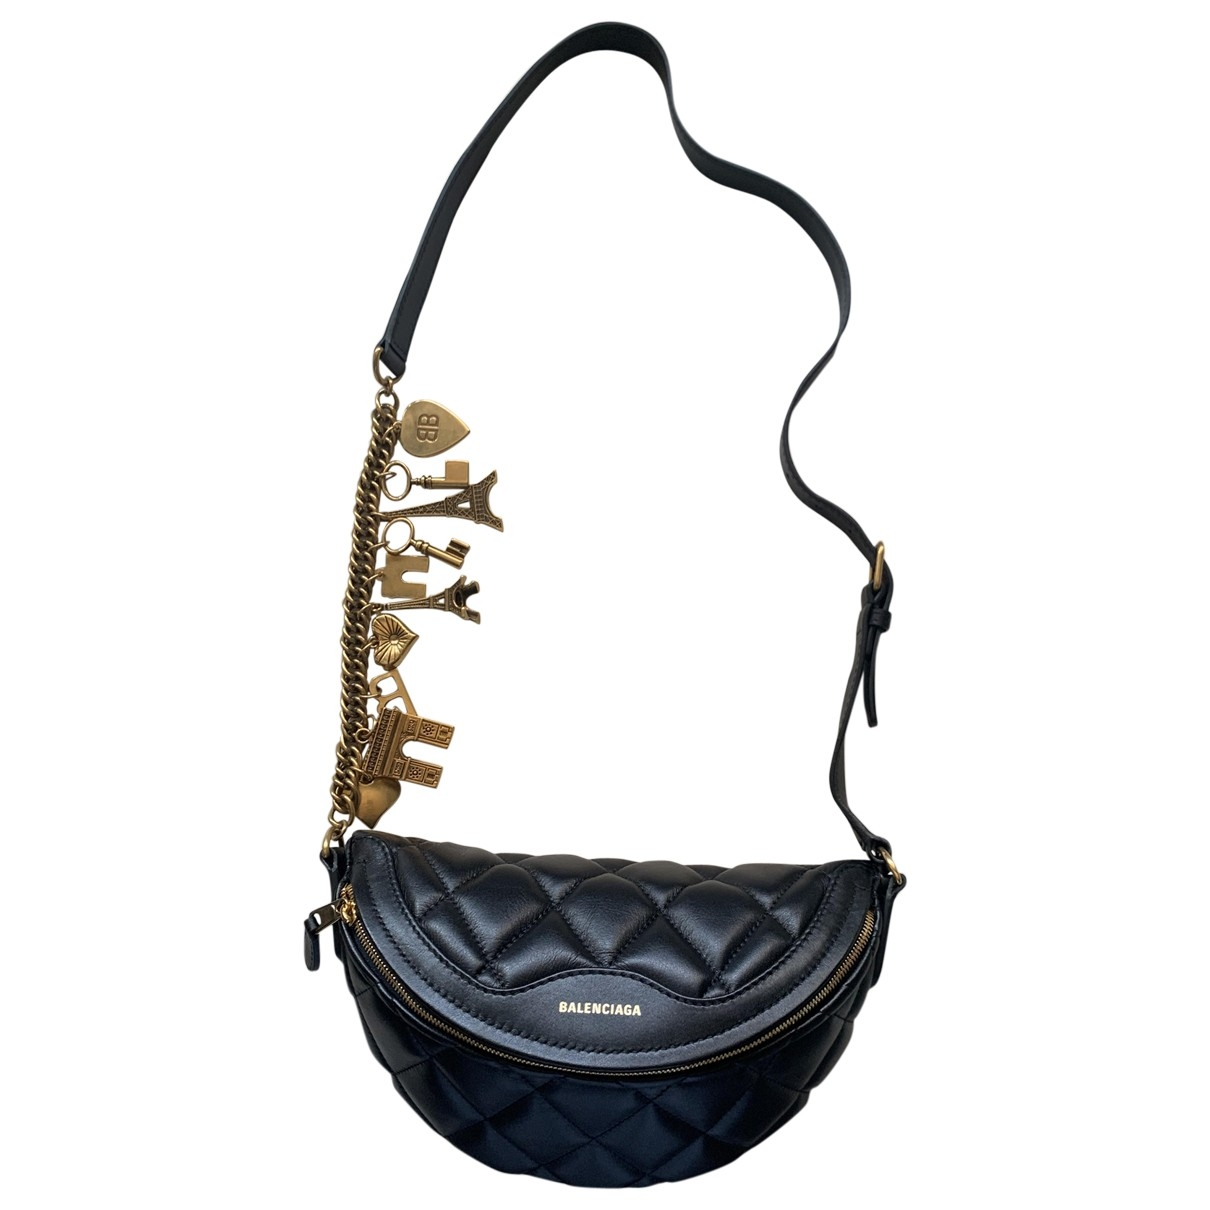 Balenciaga - Sac a main Souvenir XS pour femme en cuir - noir